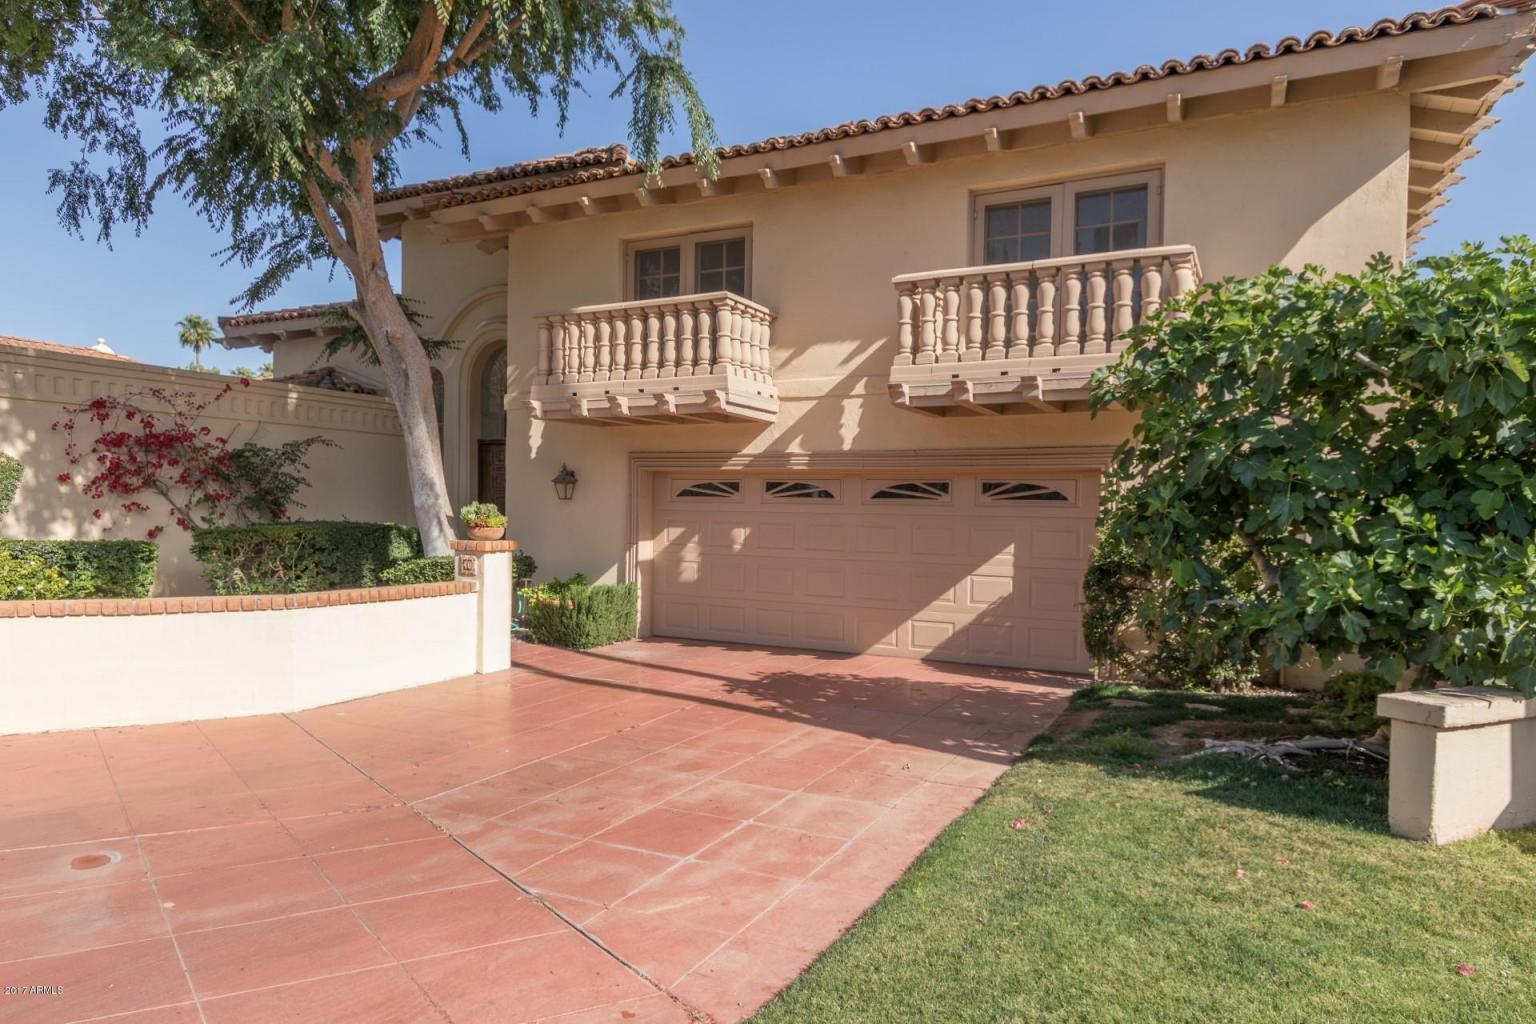 7500 E McCormick Pkwy 40, Scottsdale | $740,000